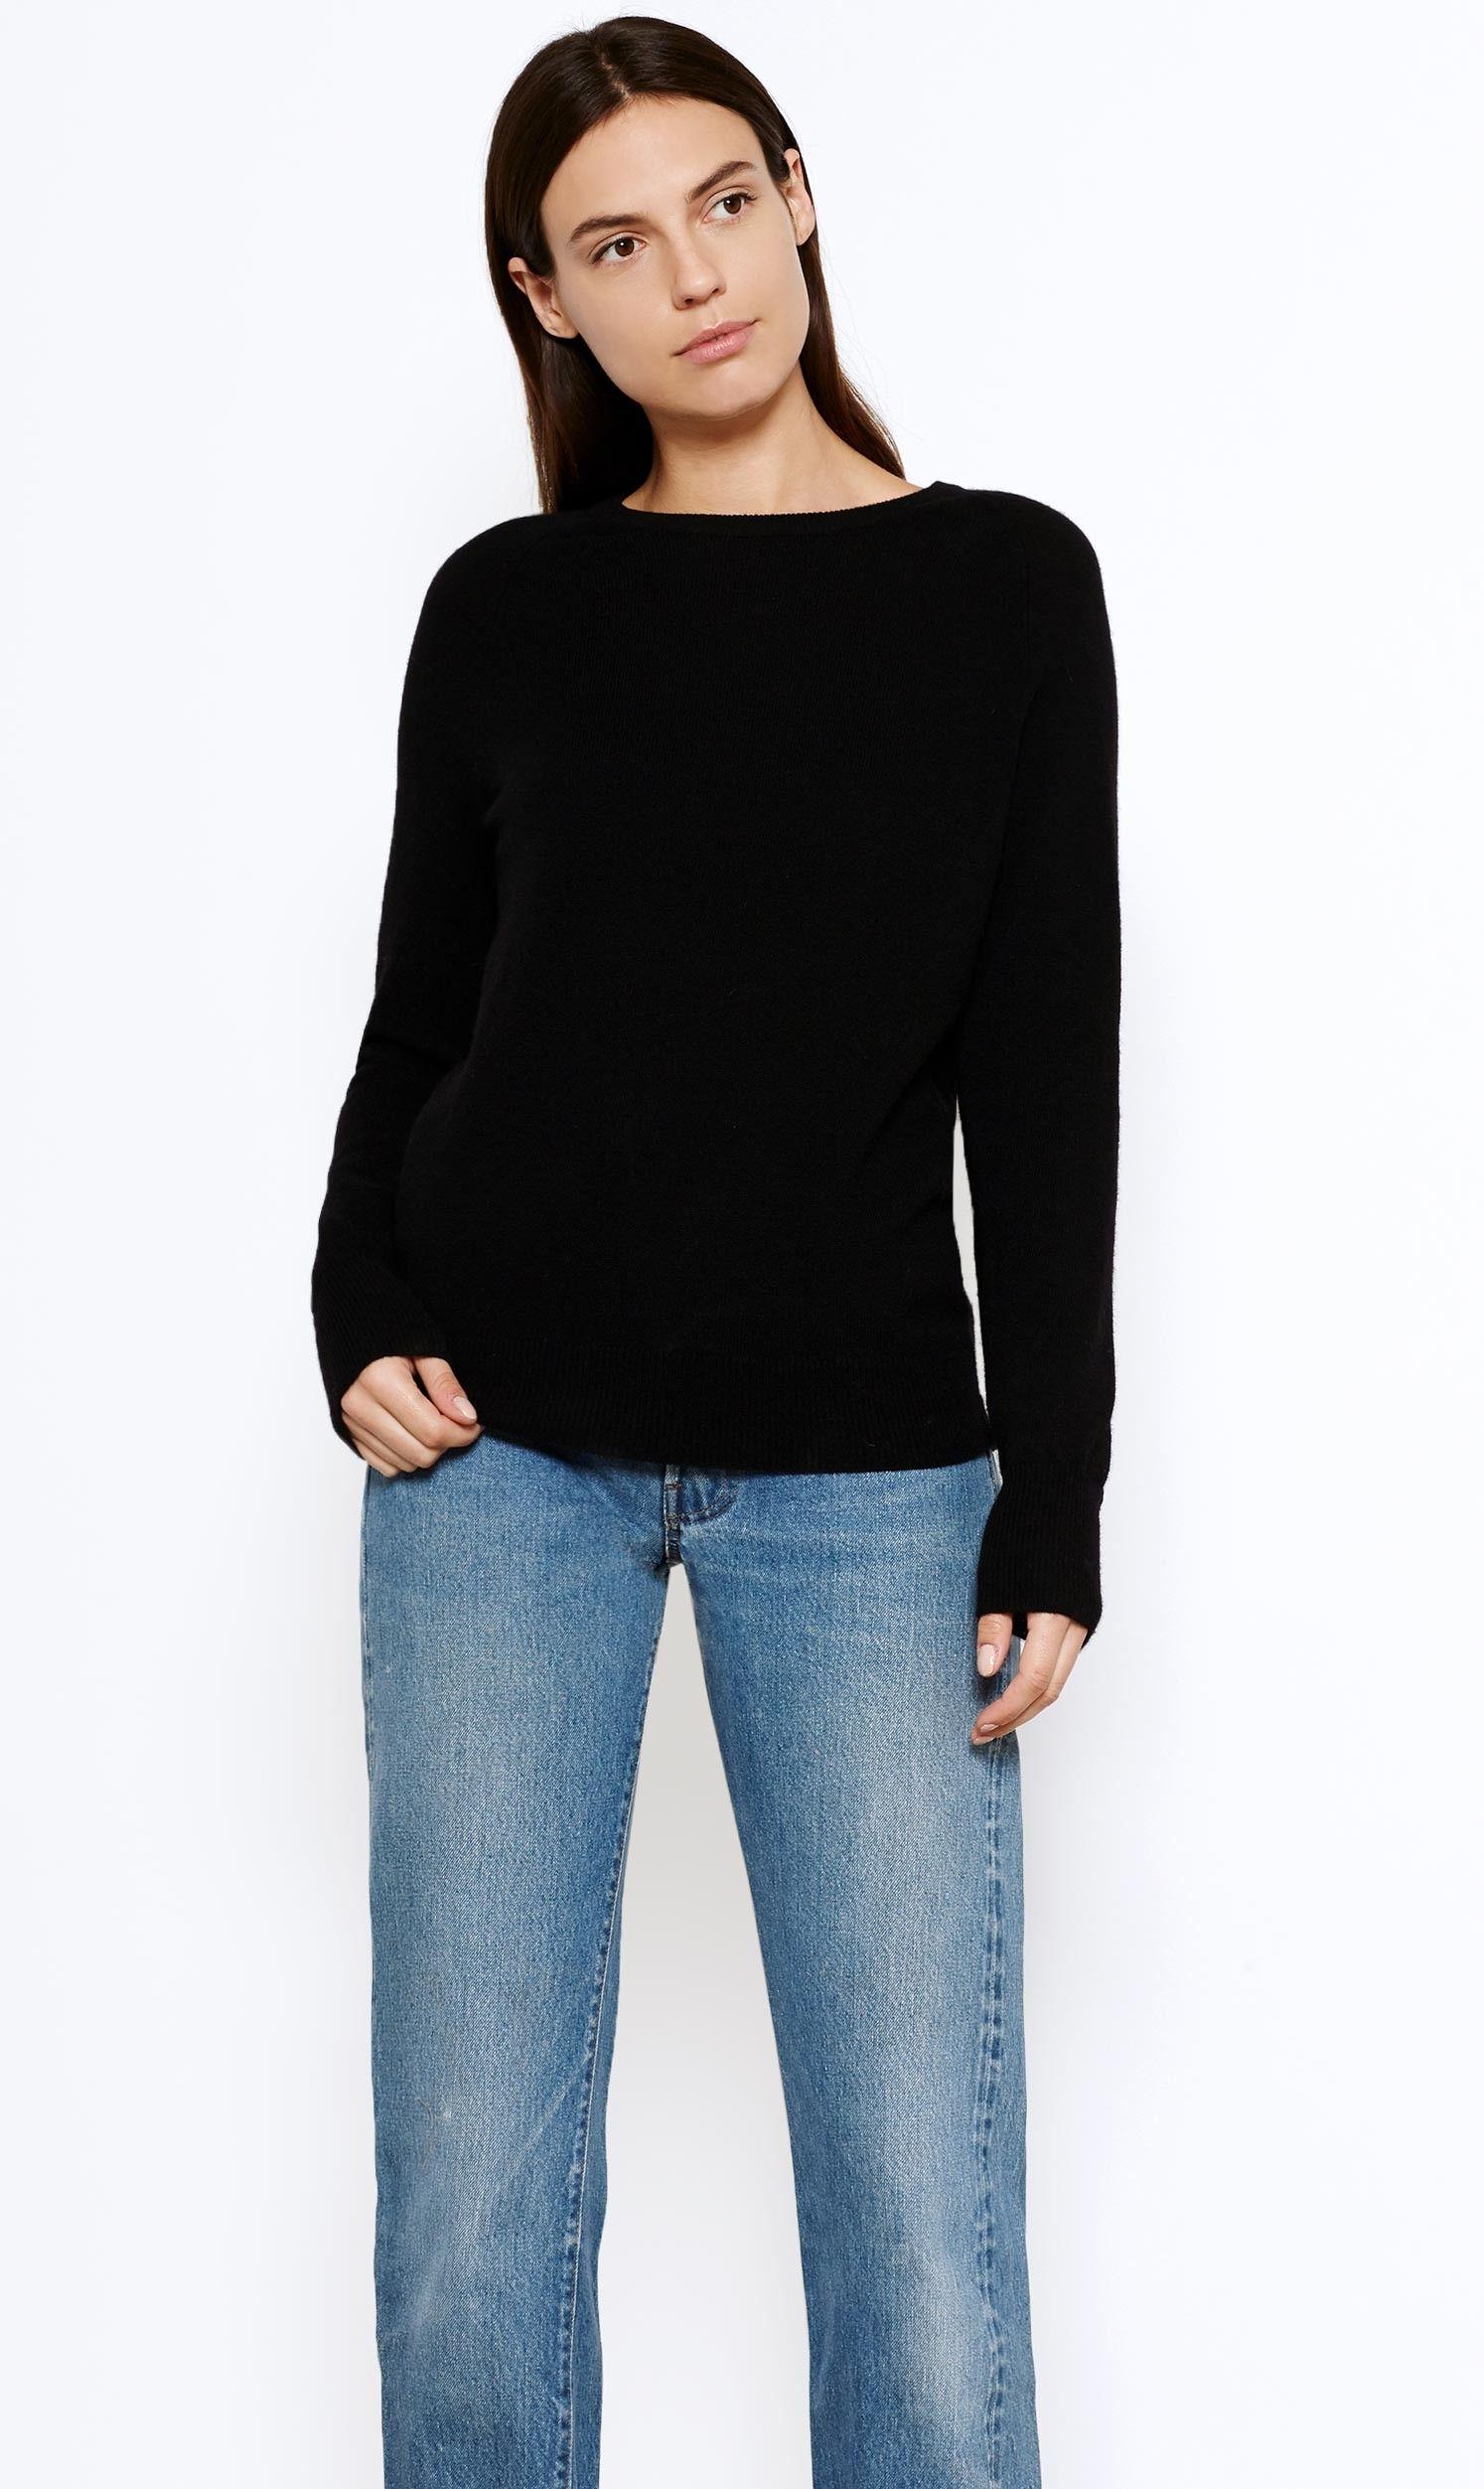 Sloane crew neck cashmere sweater | Cashmere sweaters, Cashmere ...